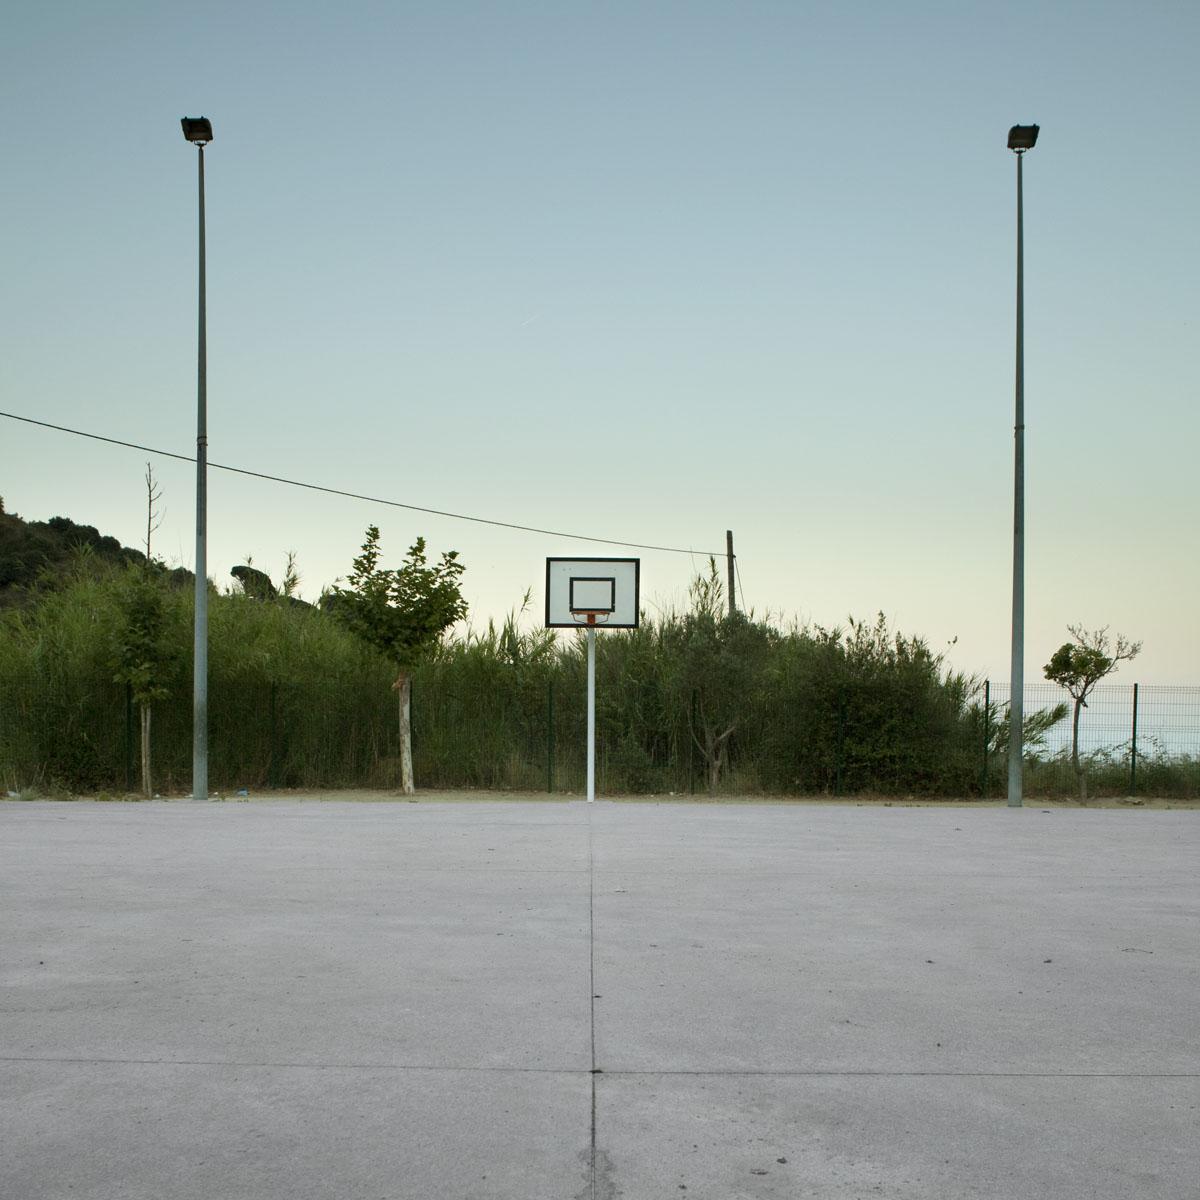 Joan Sèculi Photo - Longing for Summer